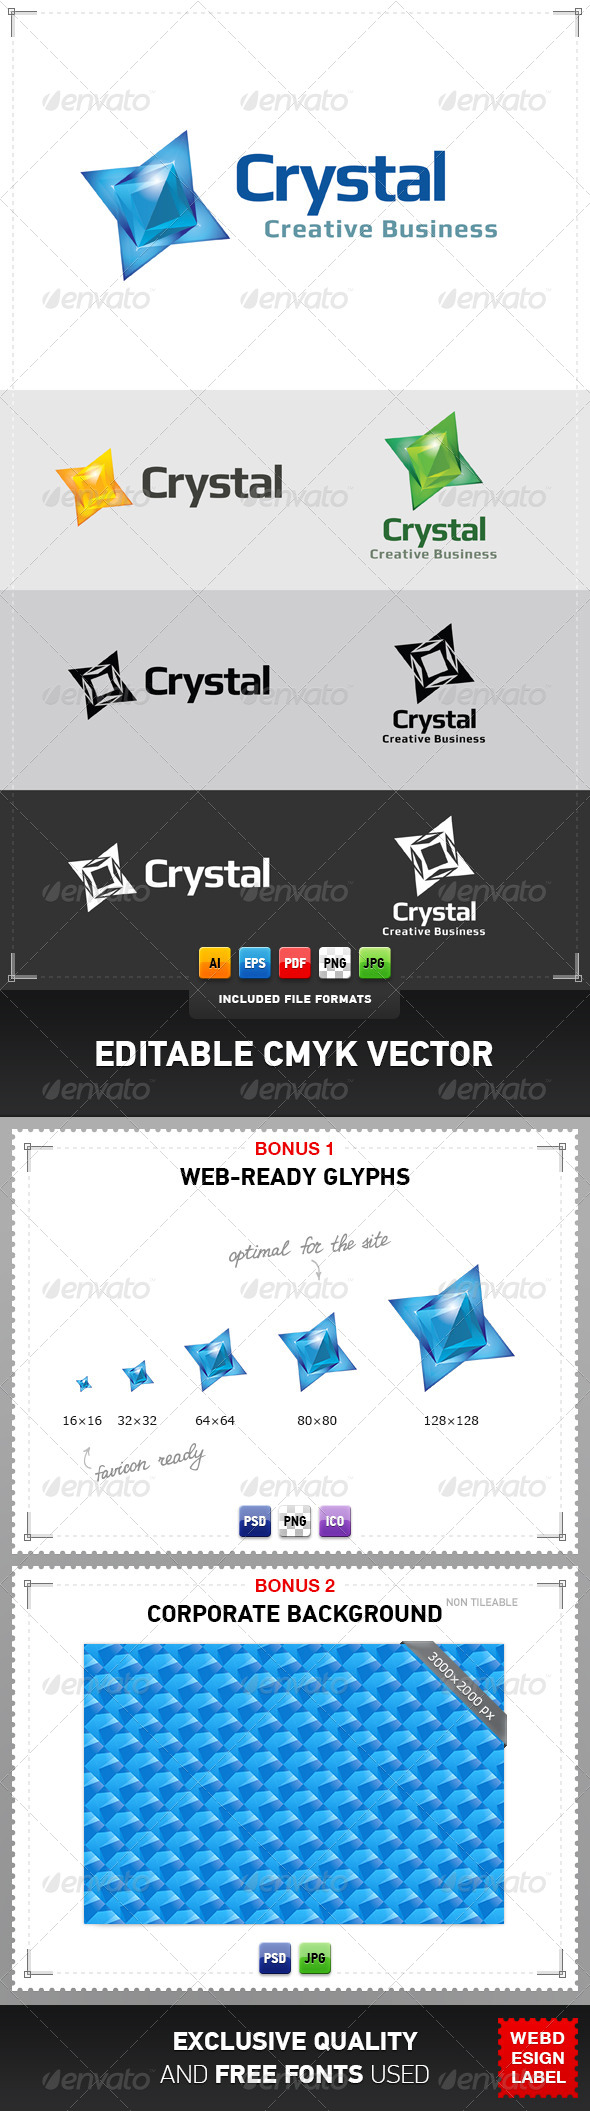 Crystal Logo - Abstract Logo Templates